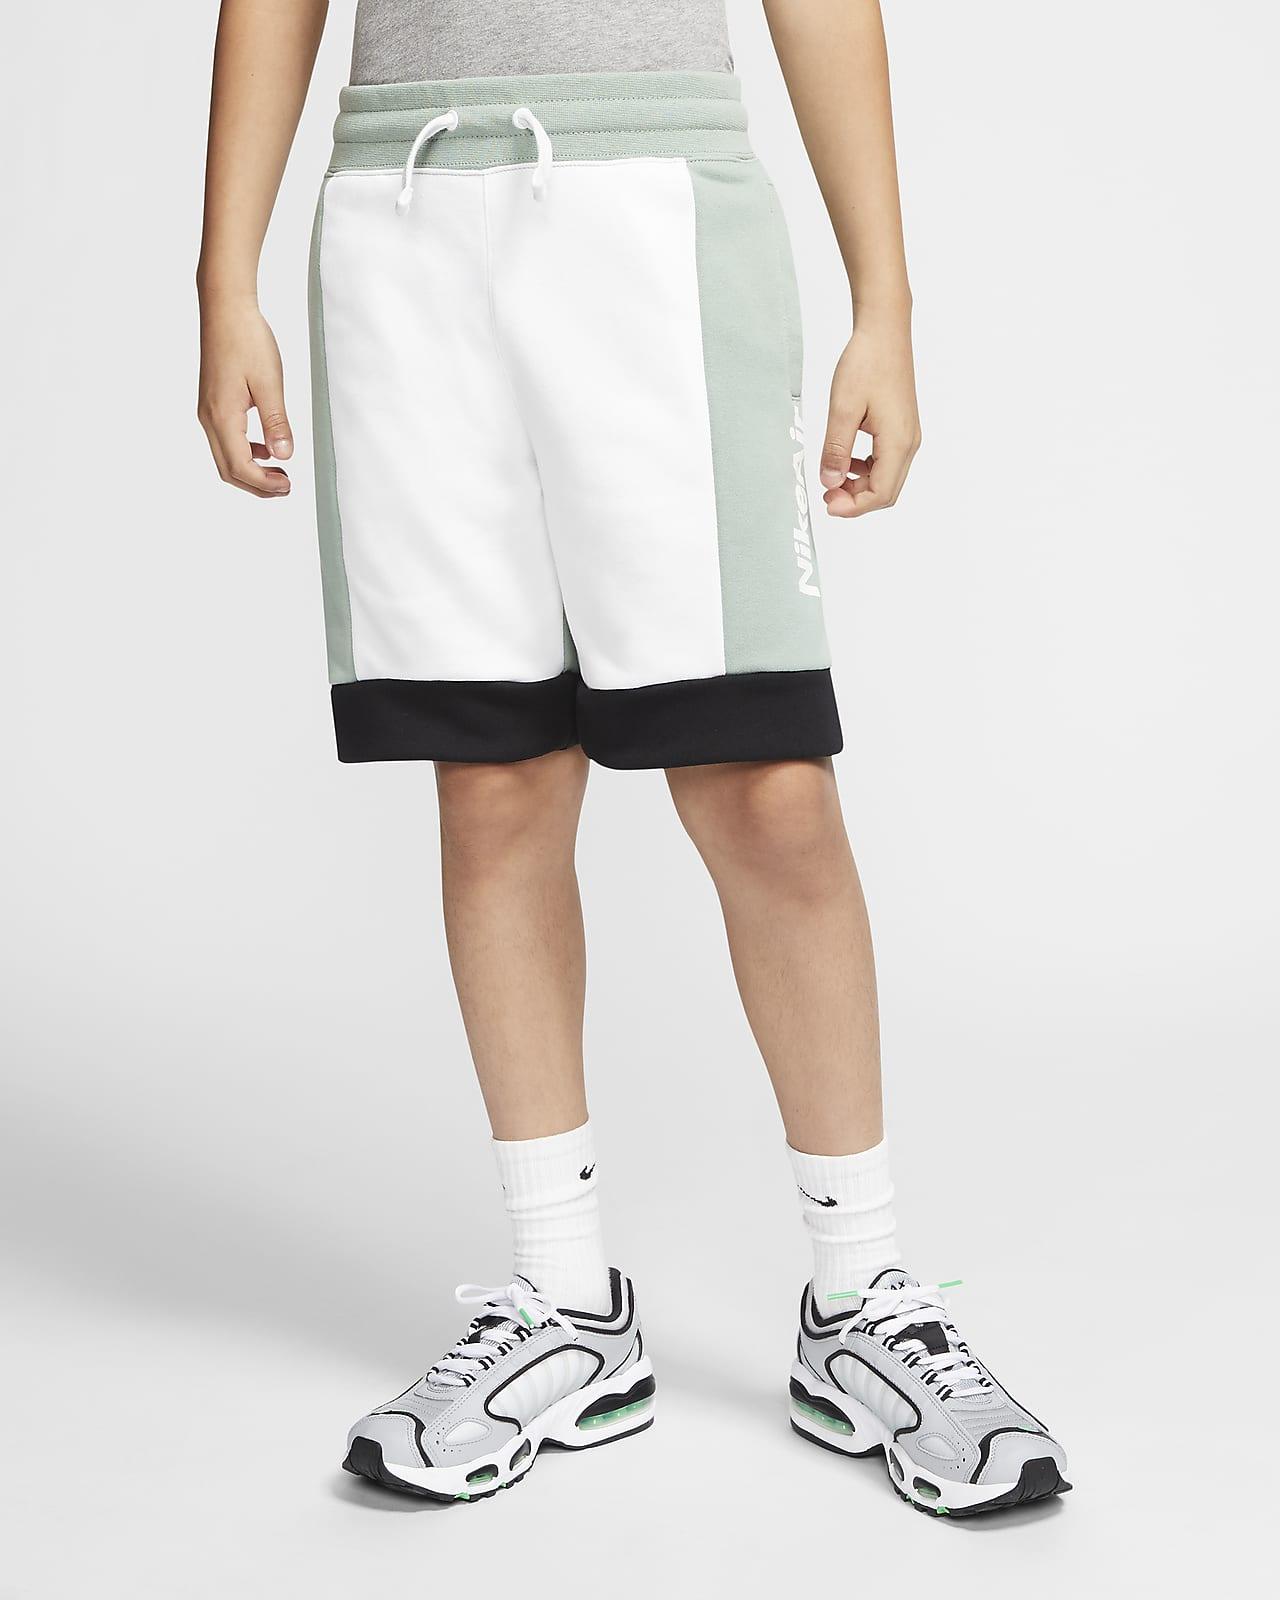 Nike Air Big Kids' (Boys') Shorts. Nike.com